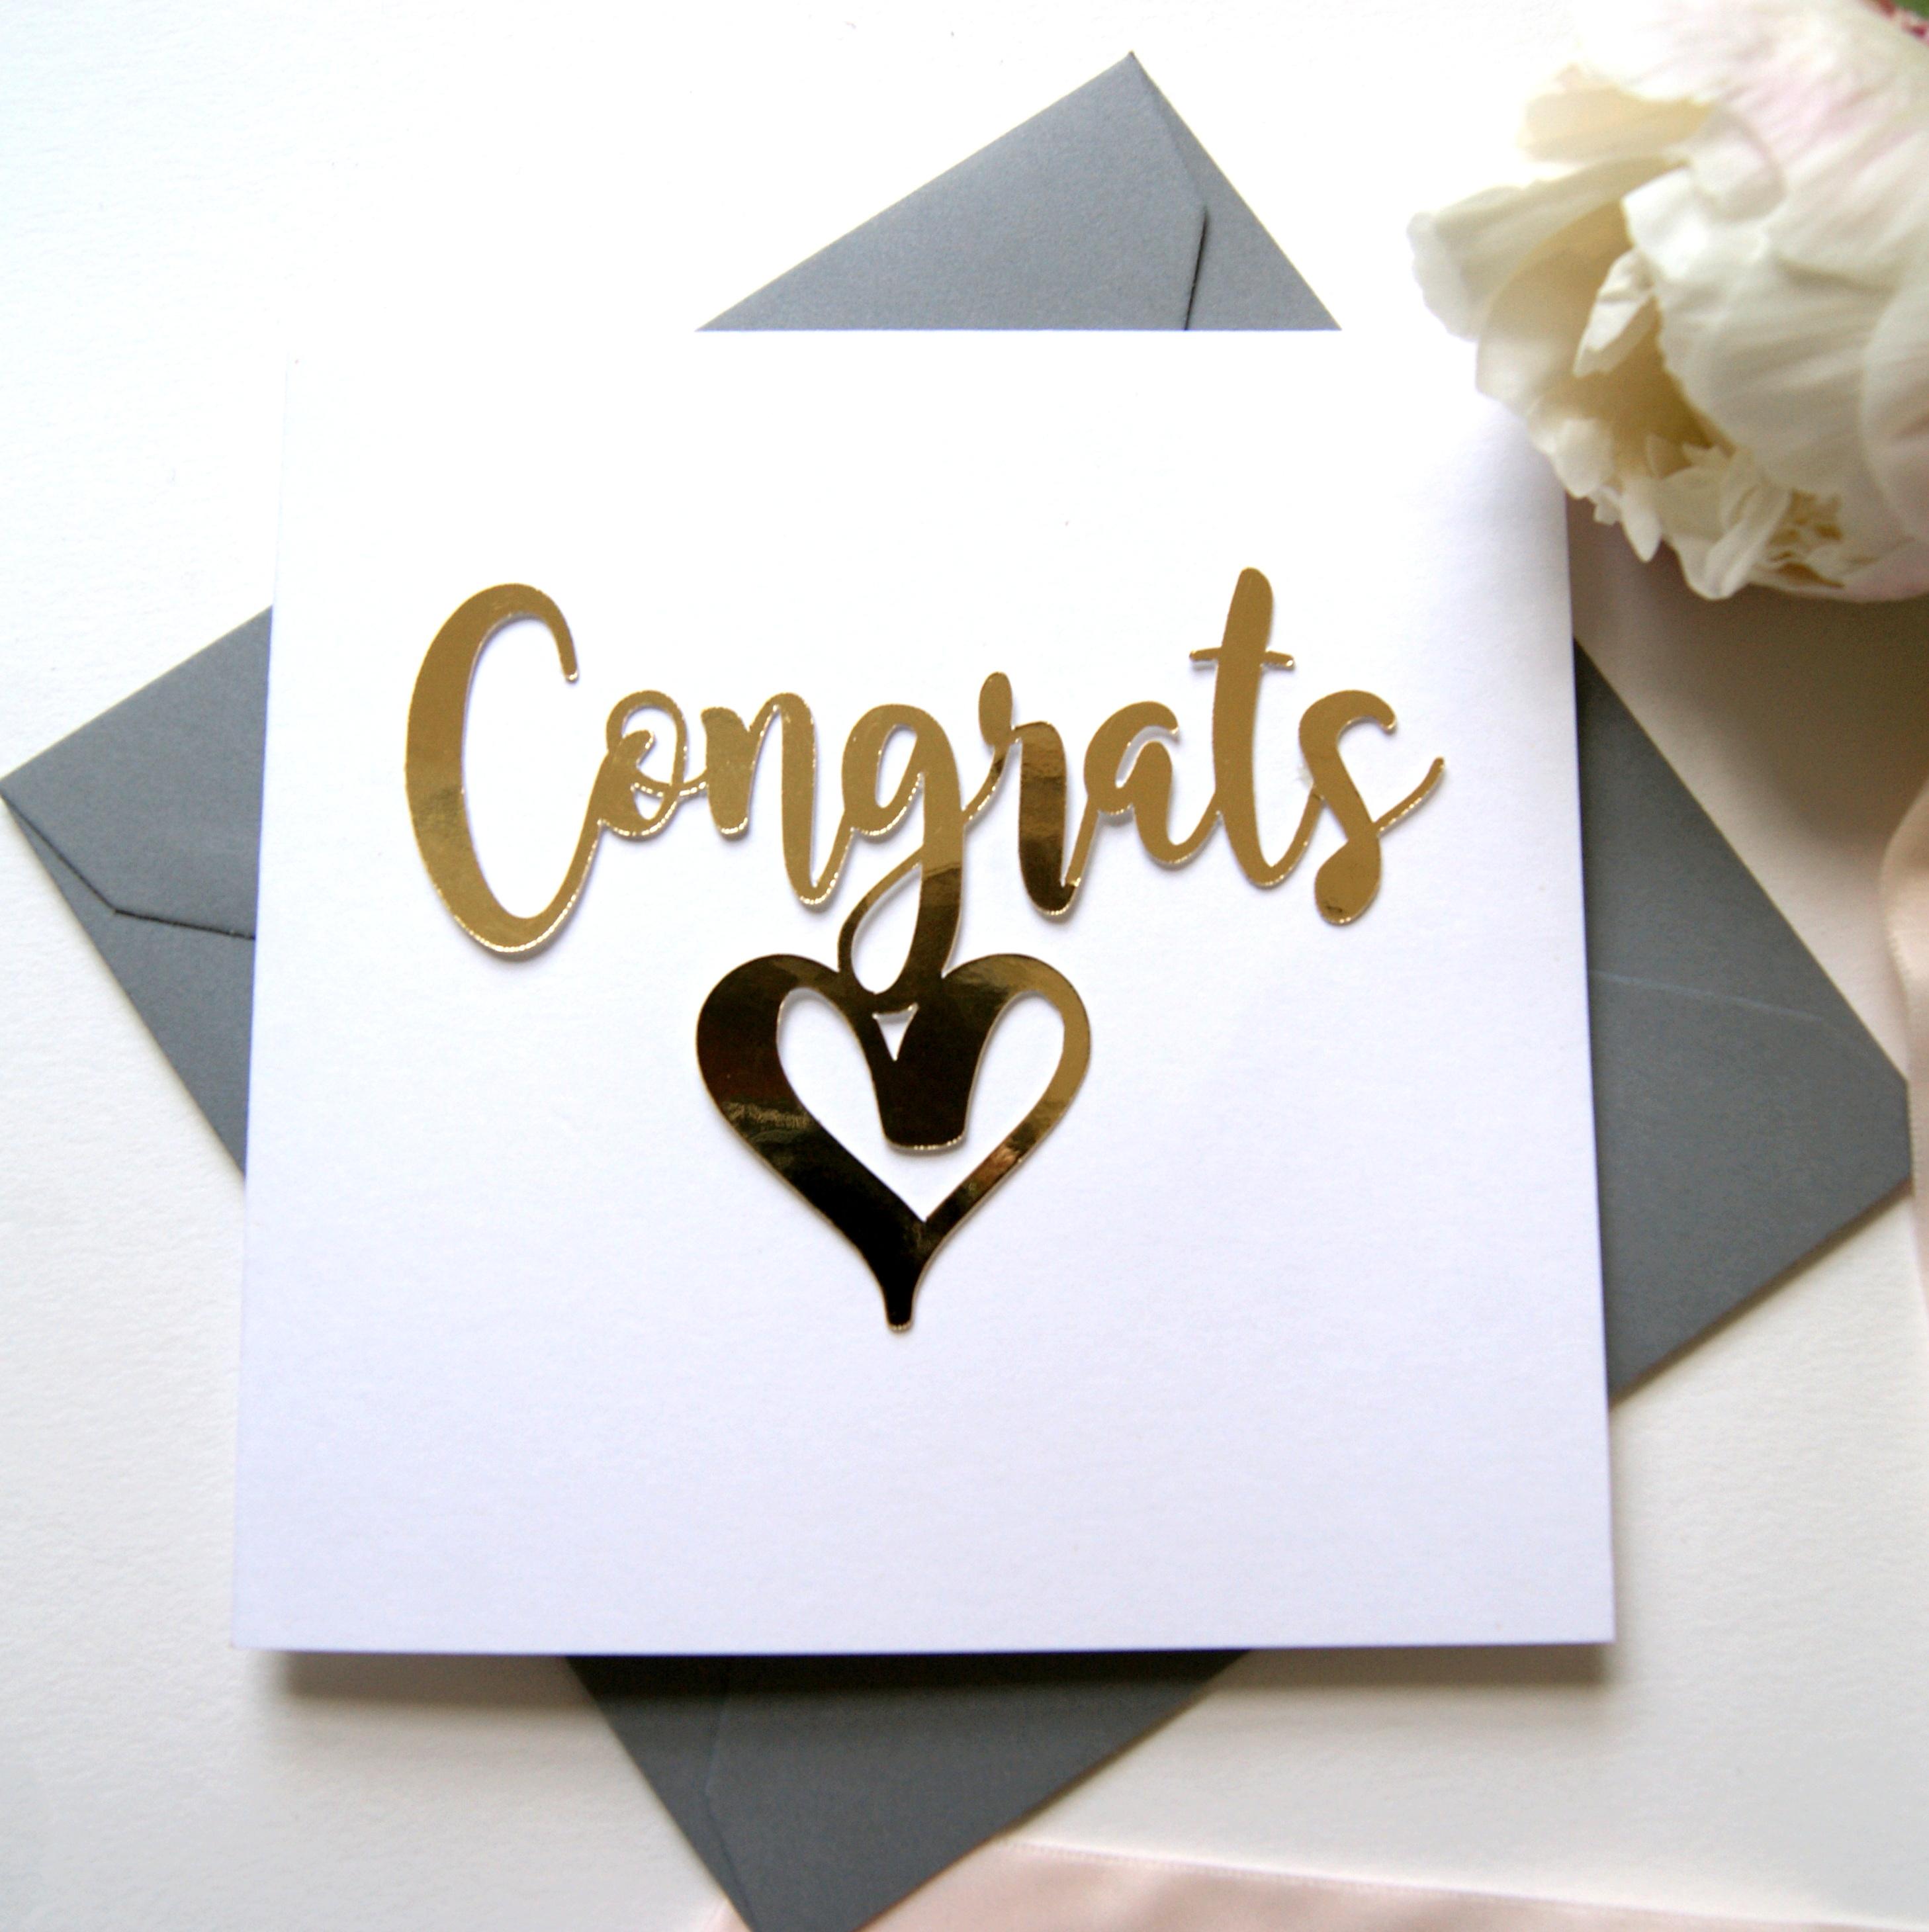 Congratulations Card Luxe Gold Shop Online Hummingbird Card Company